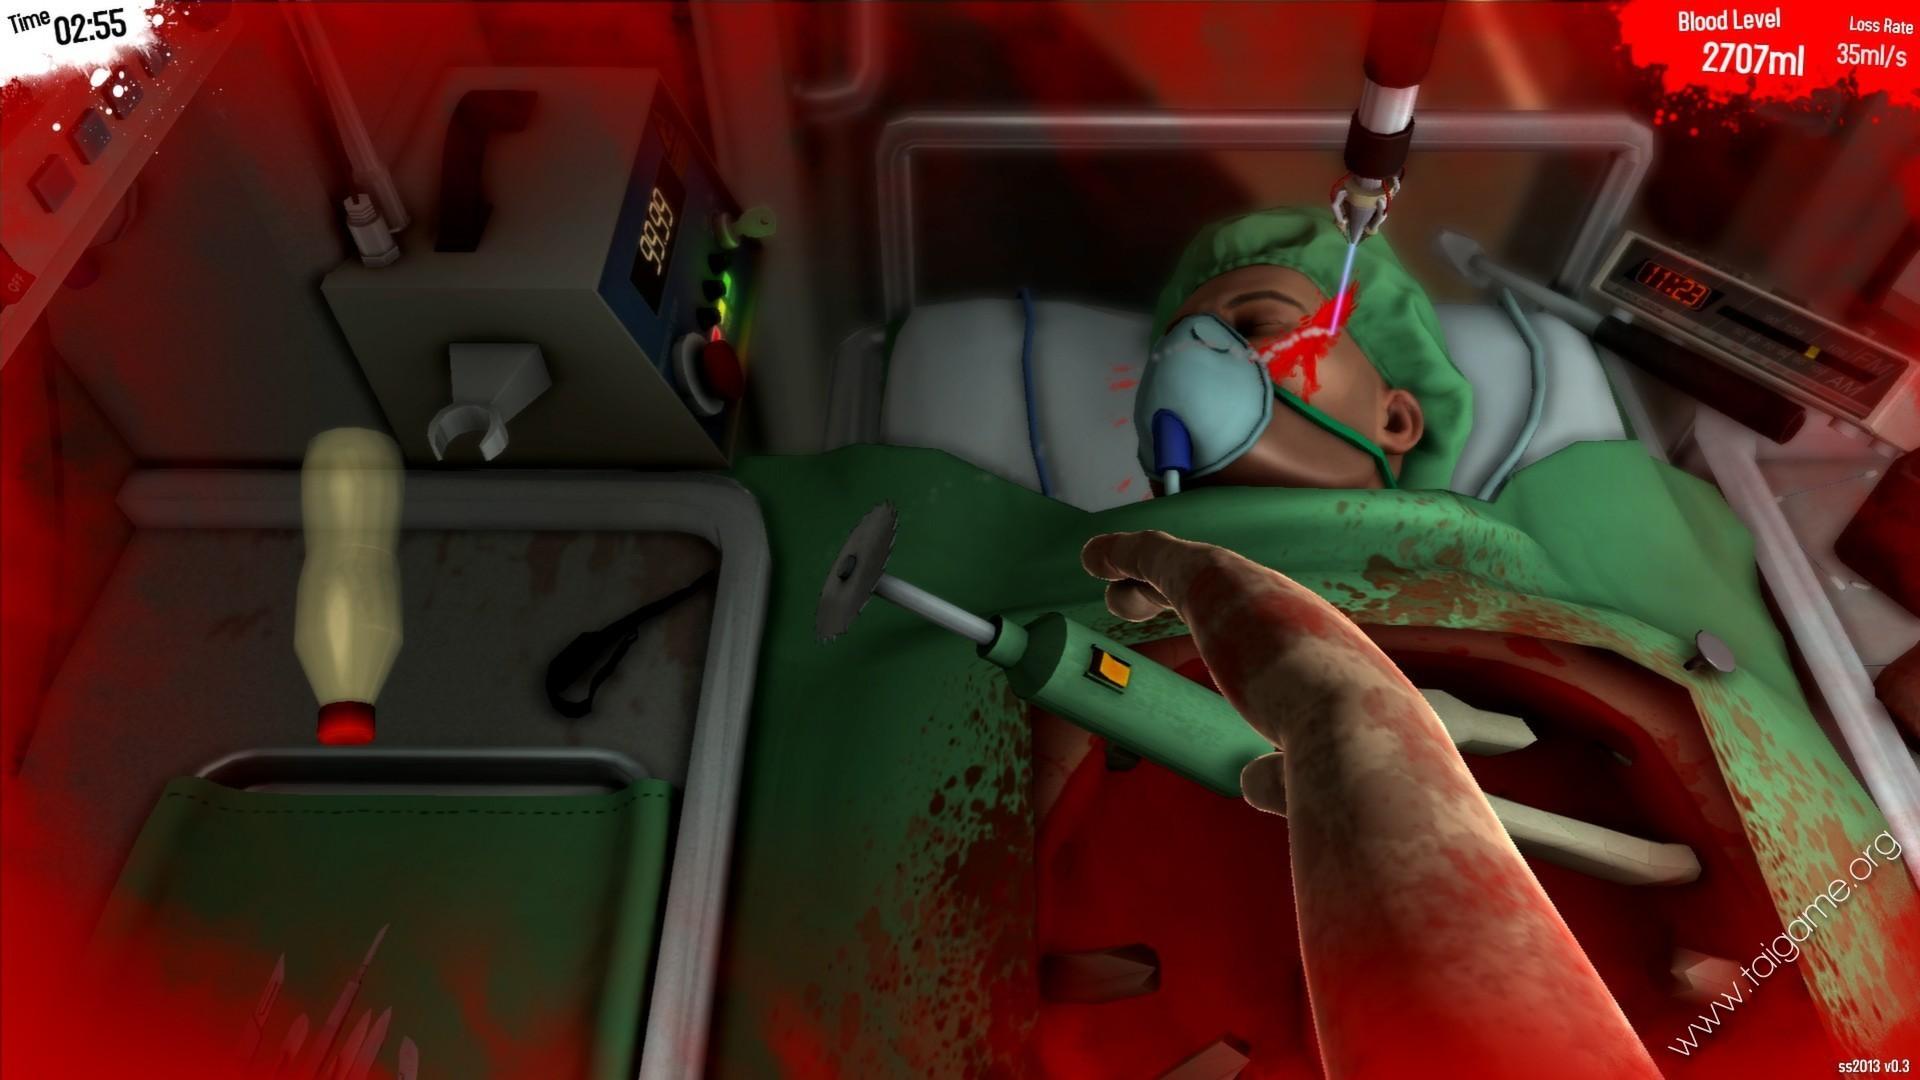 surgeon simulator online game